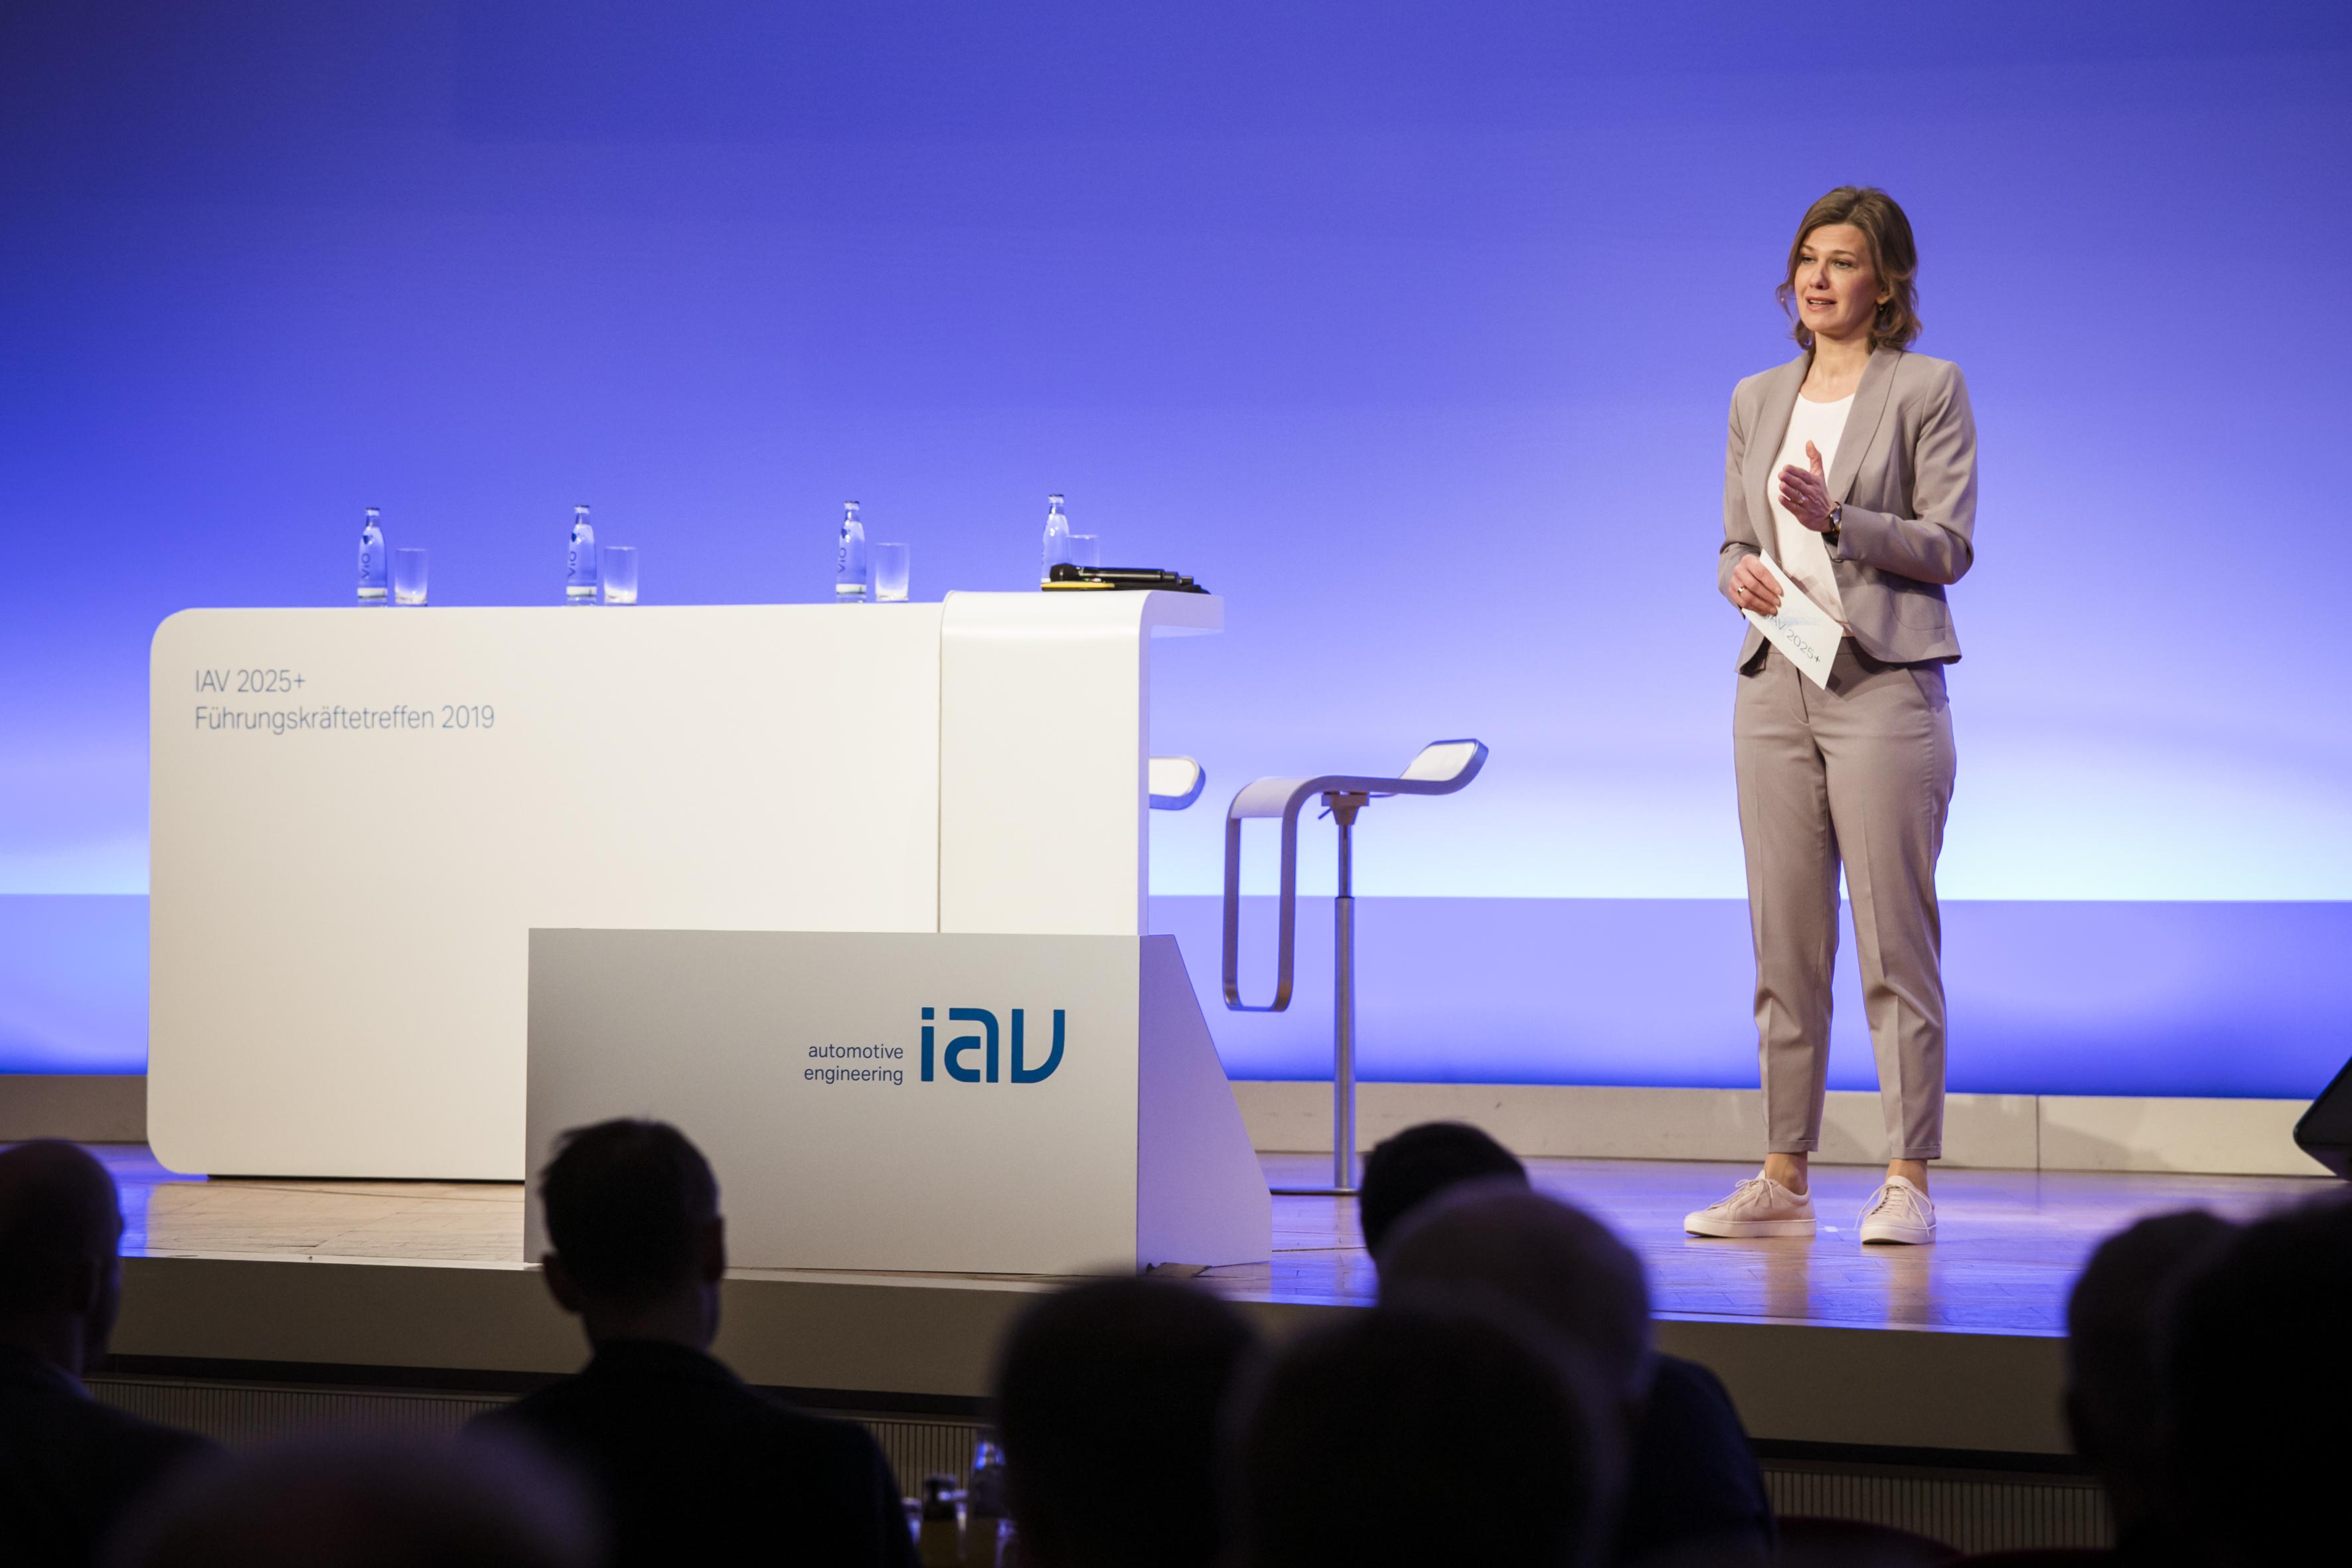 IAV_Führungskräftetreffen_FKT_2019_inspiranten015